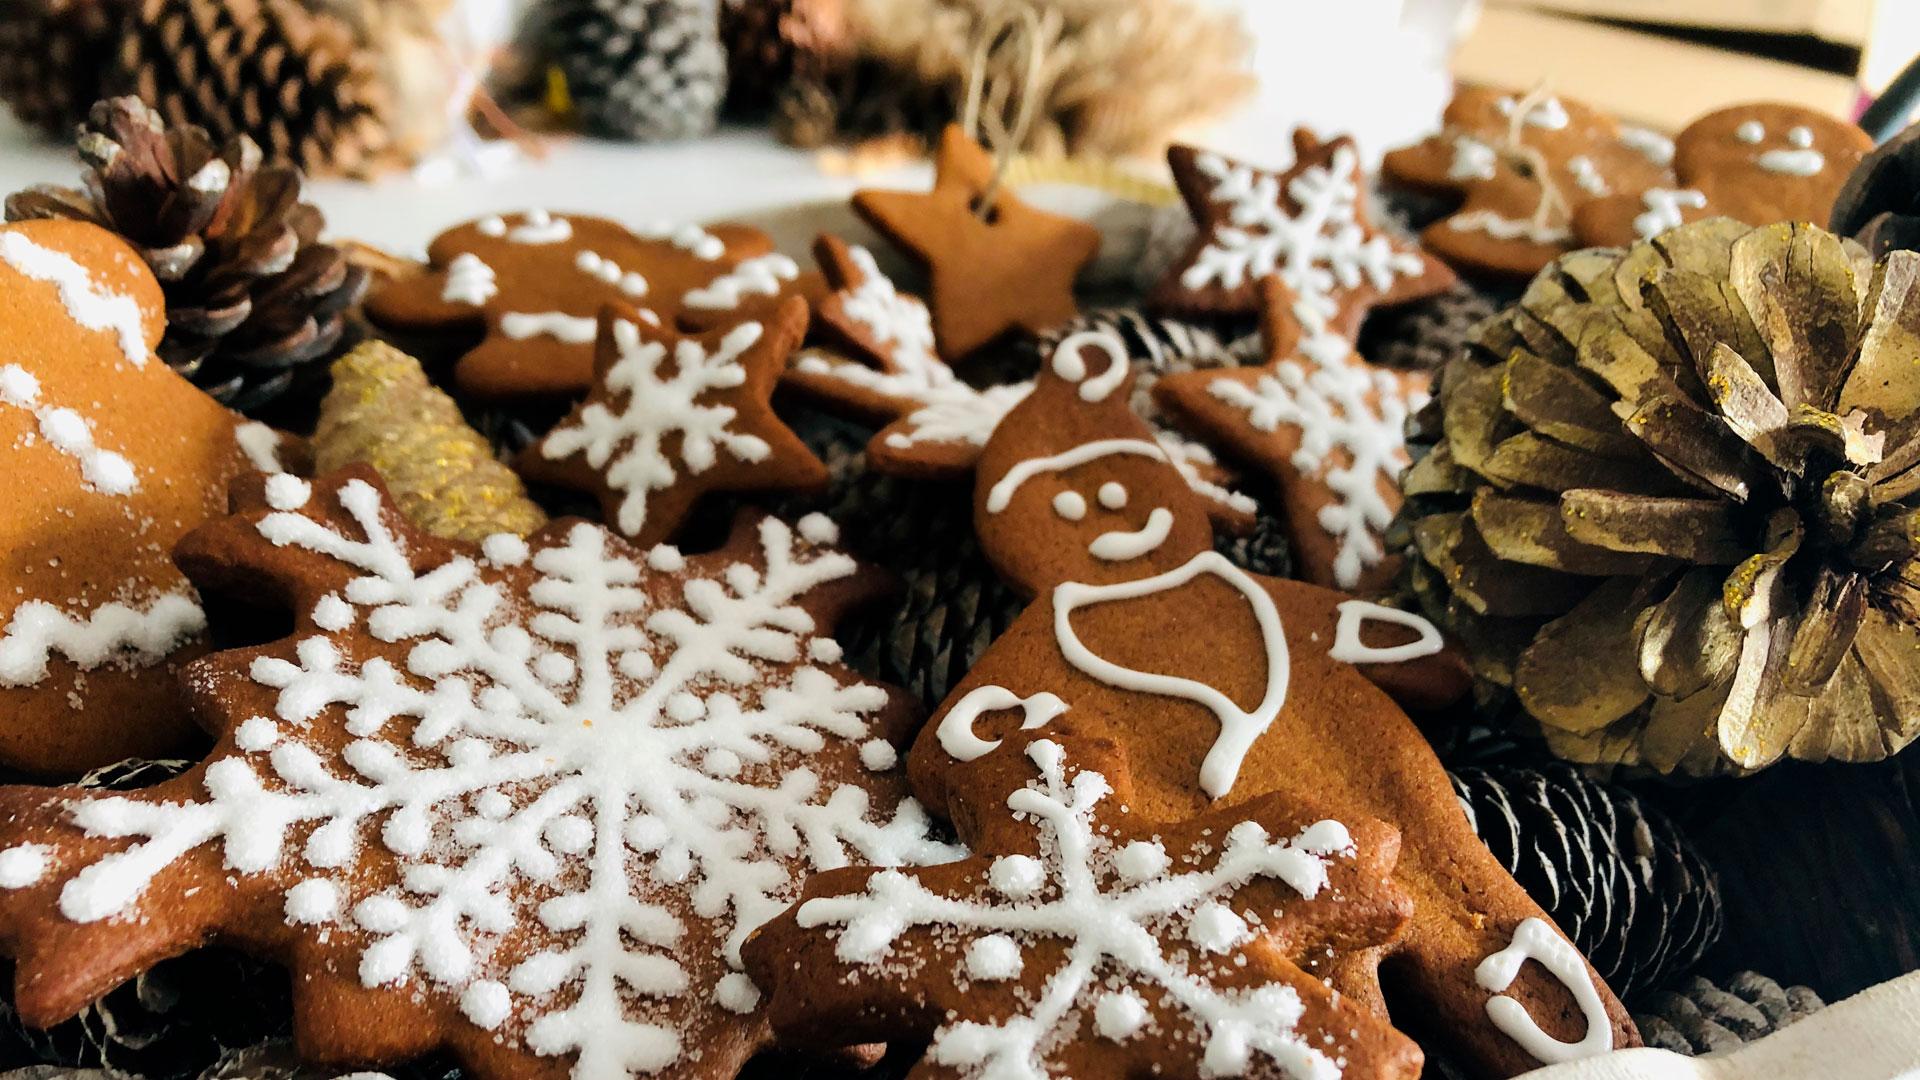 Galletas navideñas de jengibre hero asset